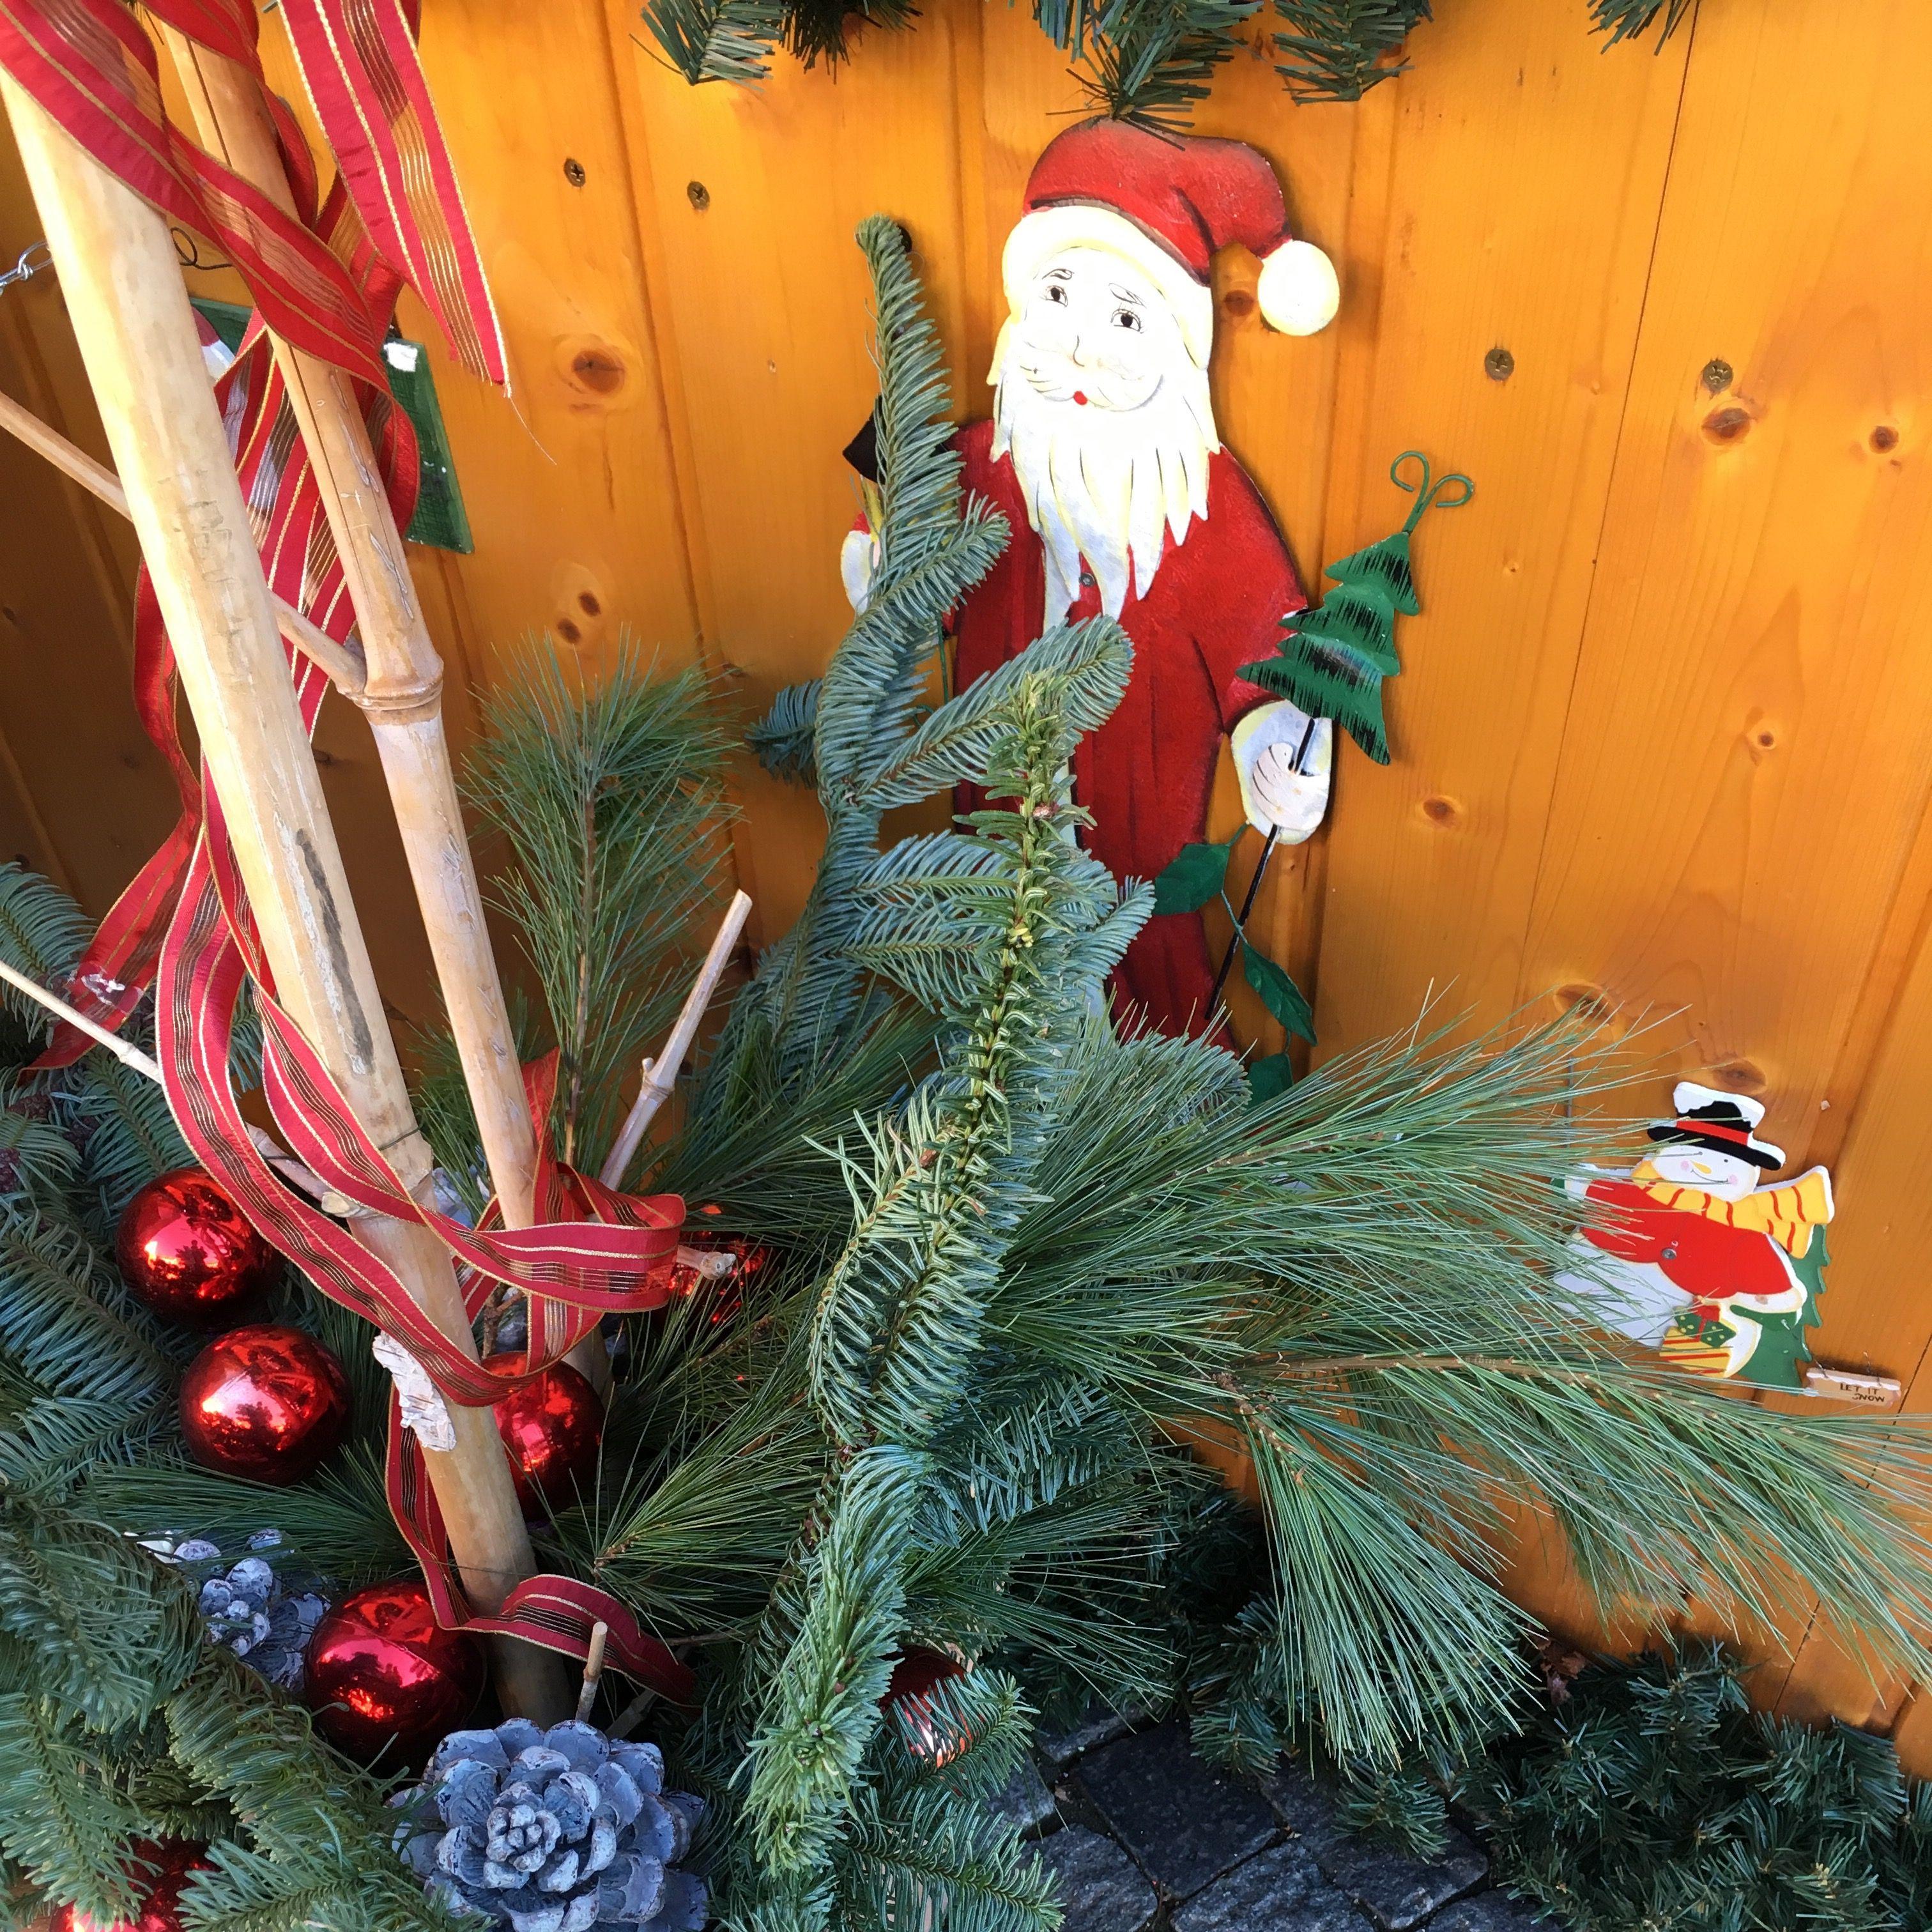 Happy Saint Nicholas Day 🎄❄ 🎅 Fröhlich Adventszeit ...